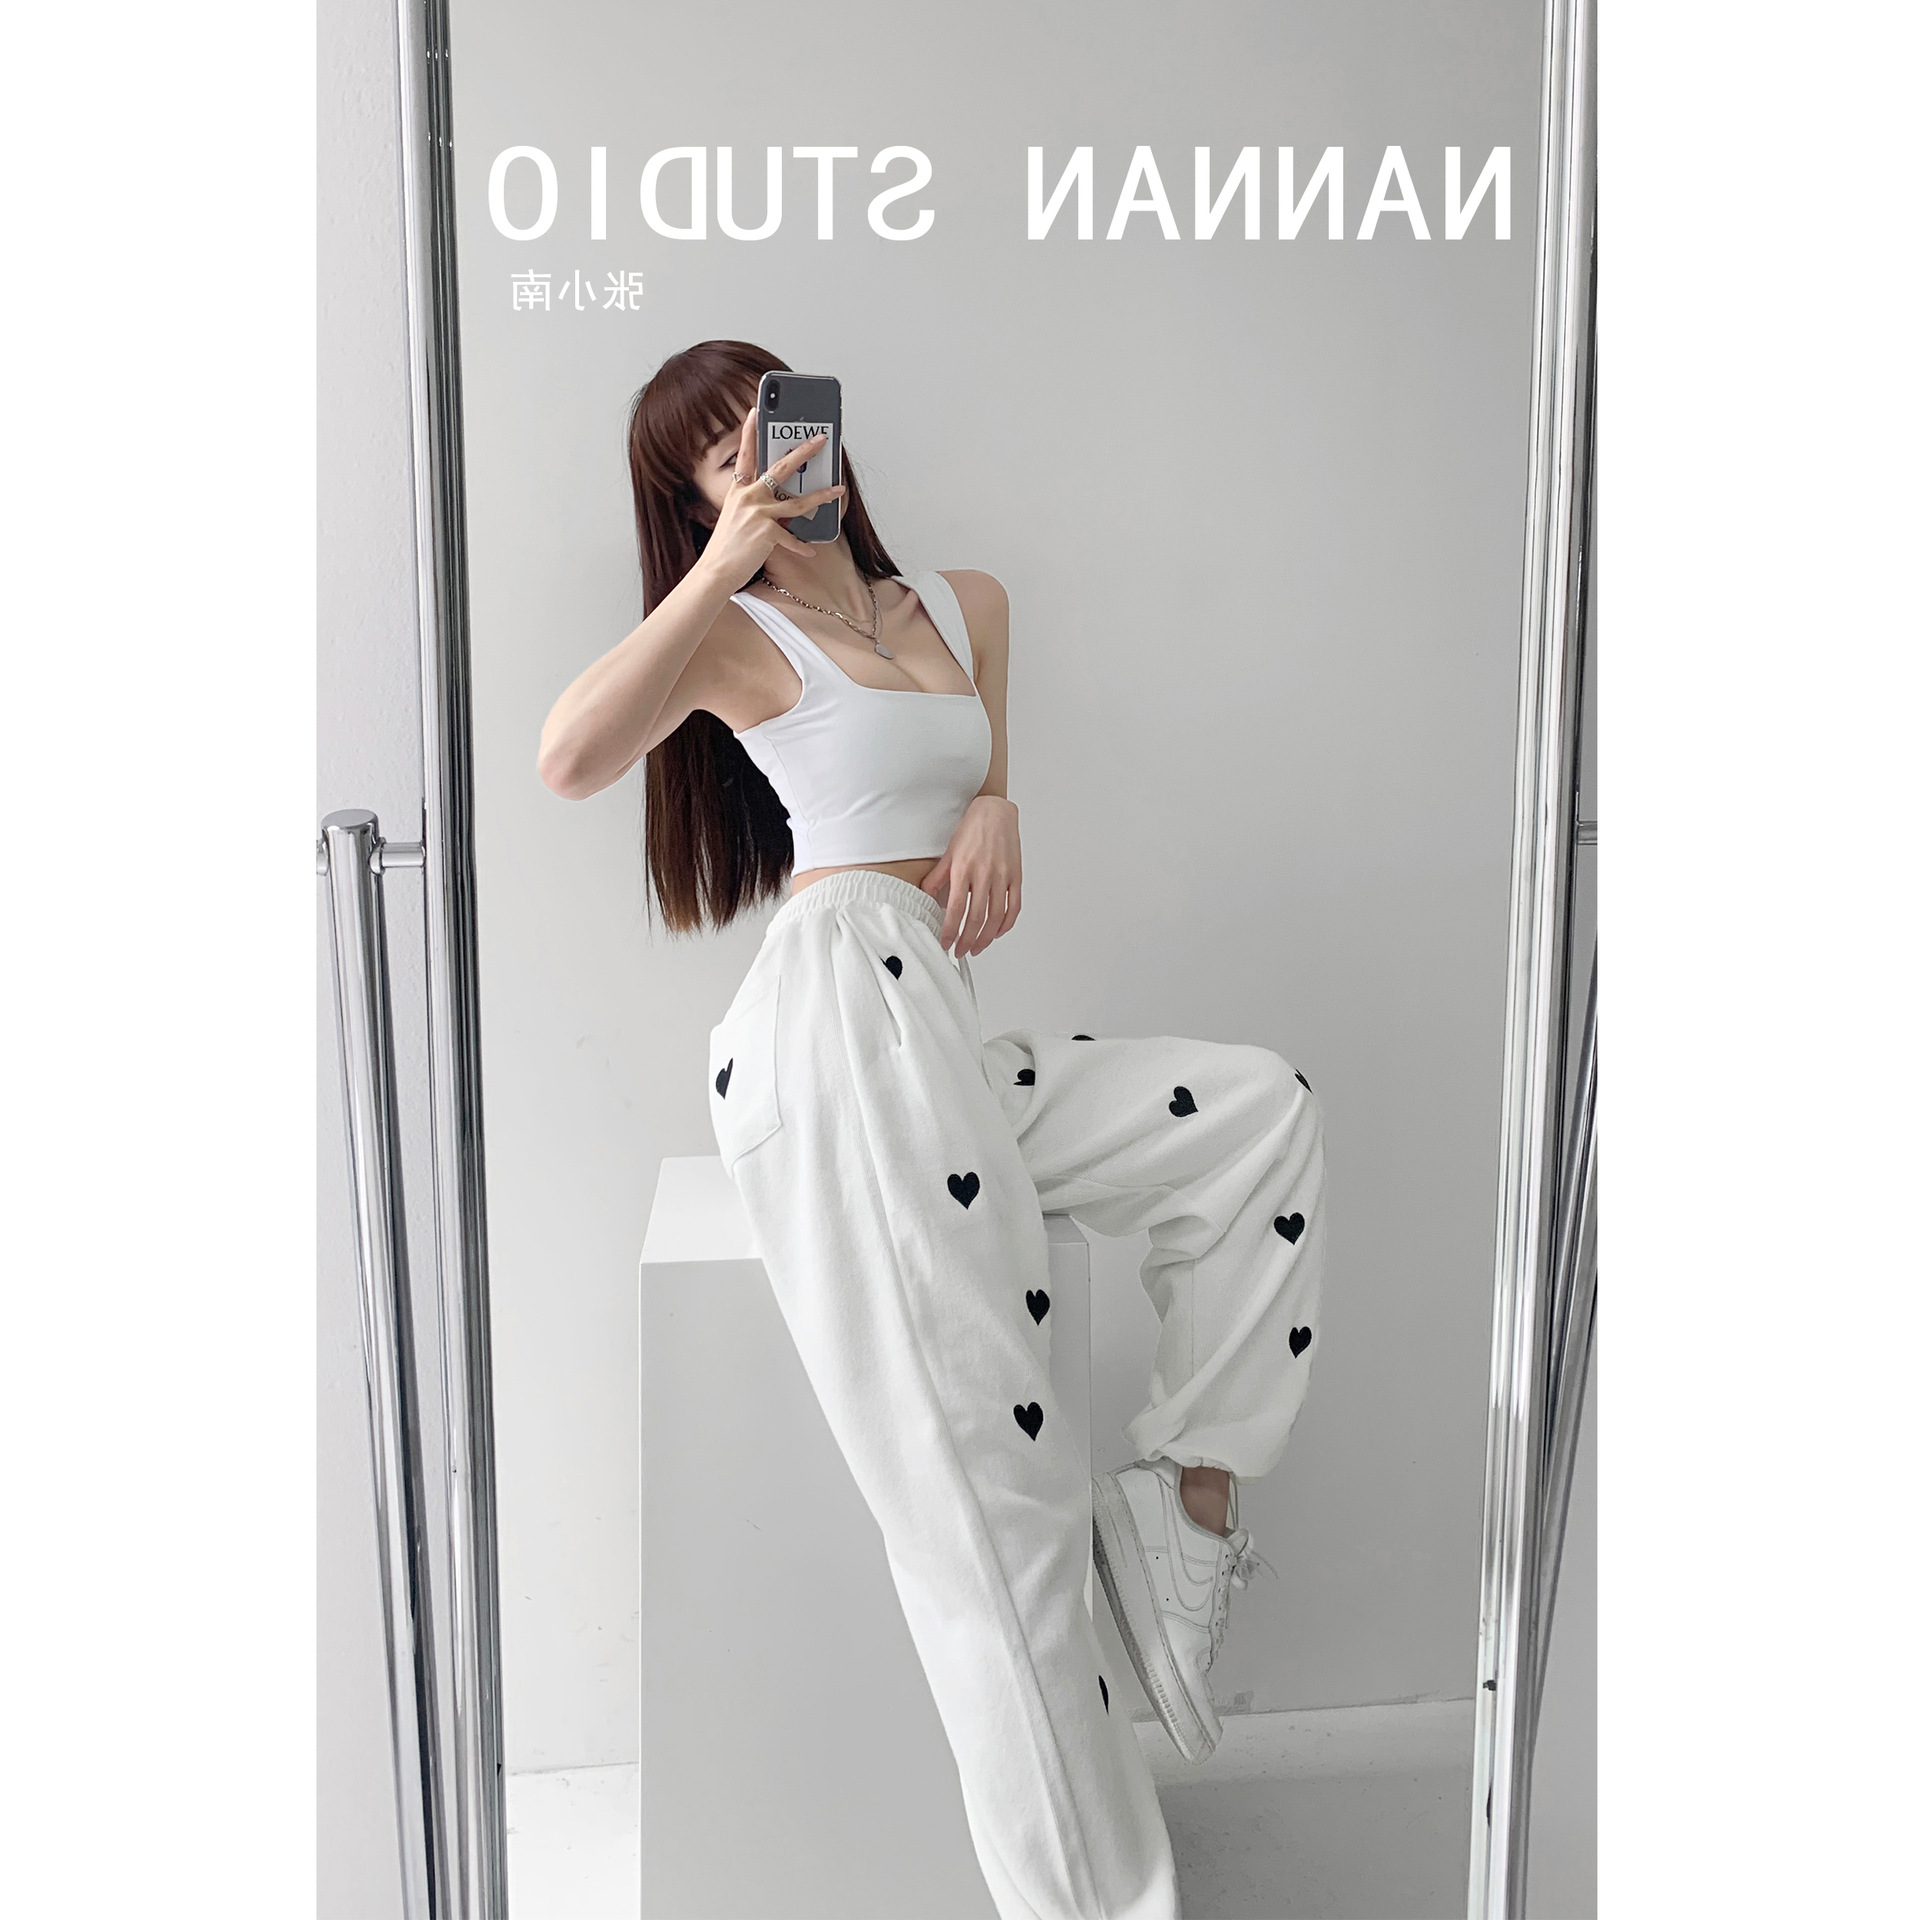 2021 thin hot girl street style printed love sweatpants women's thin high waist elastic waist panties casual loose